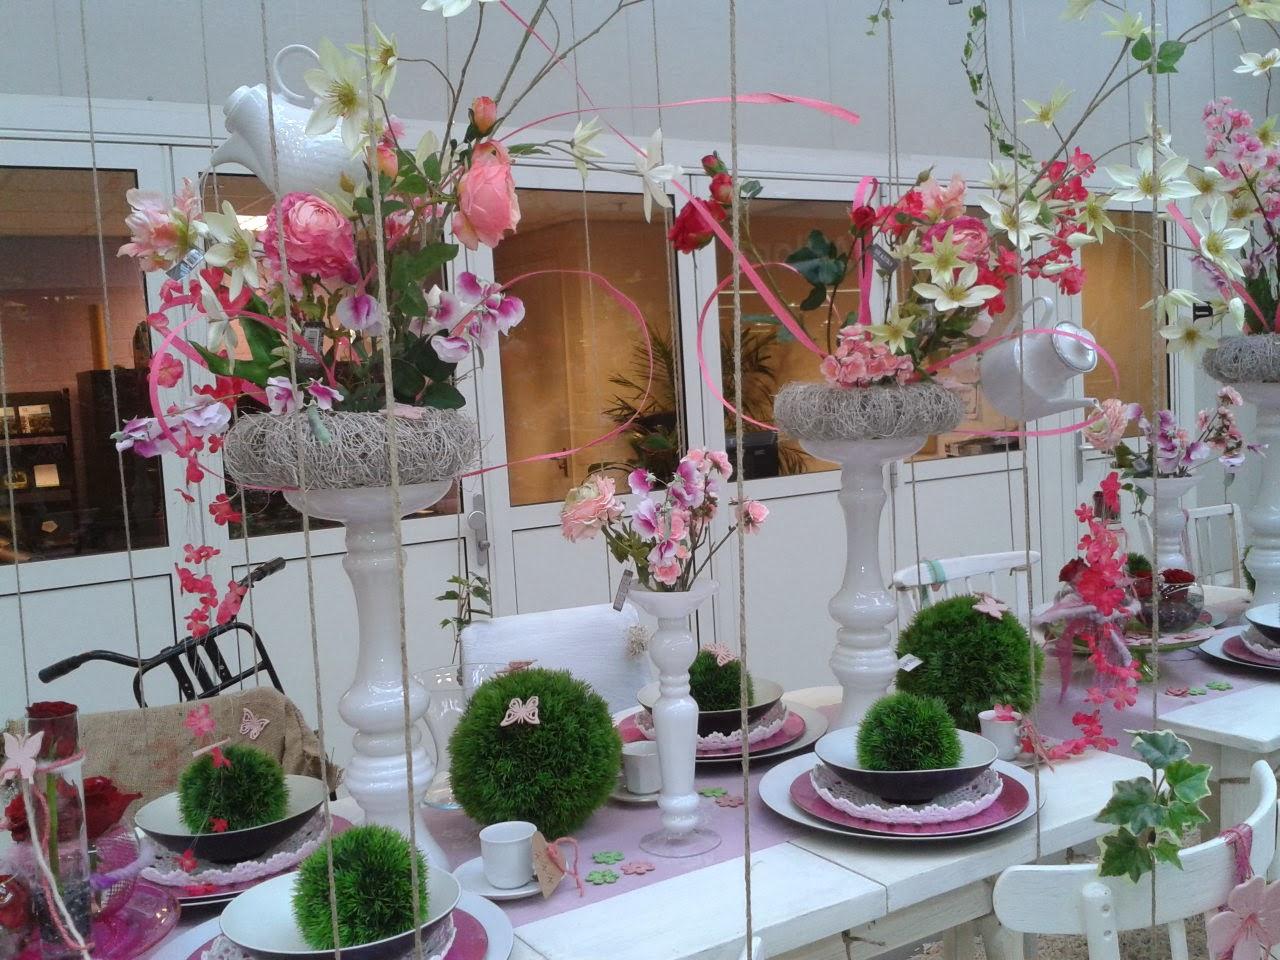 Home jasmin les mariages centre de table for Table 52 cairns 2014